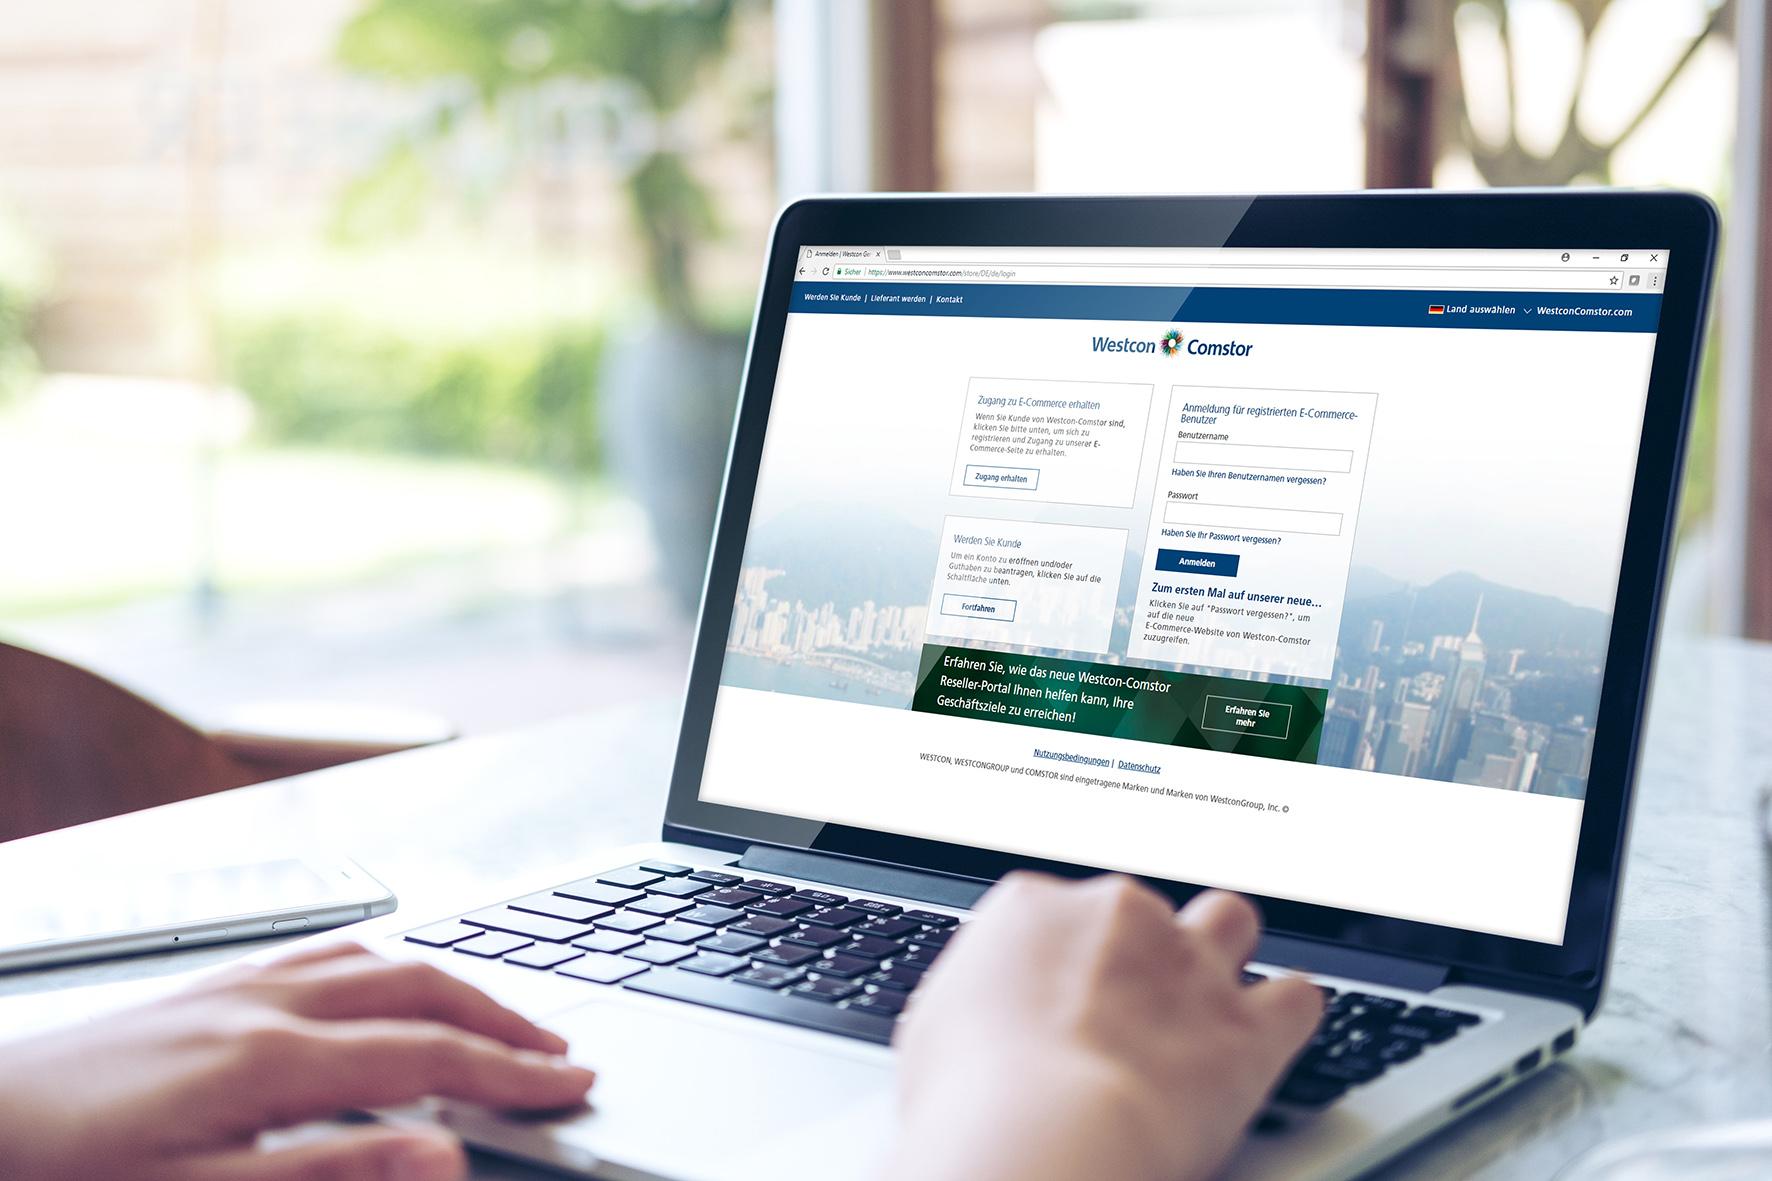 Das neue E-Commerce 2.0-Portal von Westcon-Comstor ist unter www.westconcomstor.com/store online.